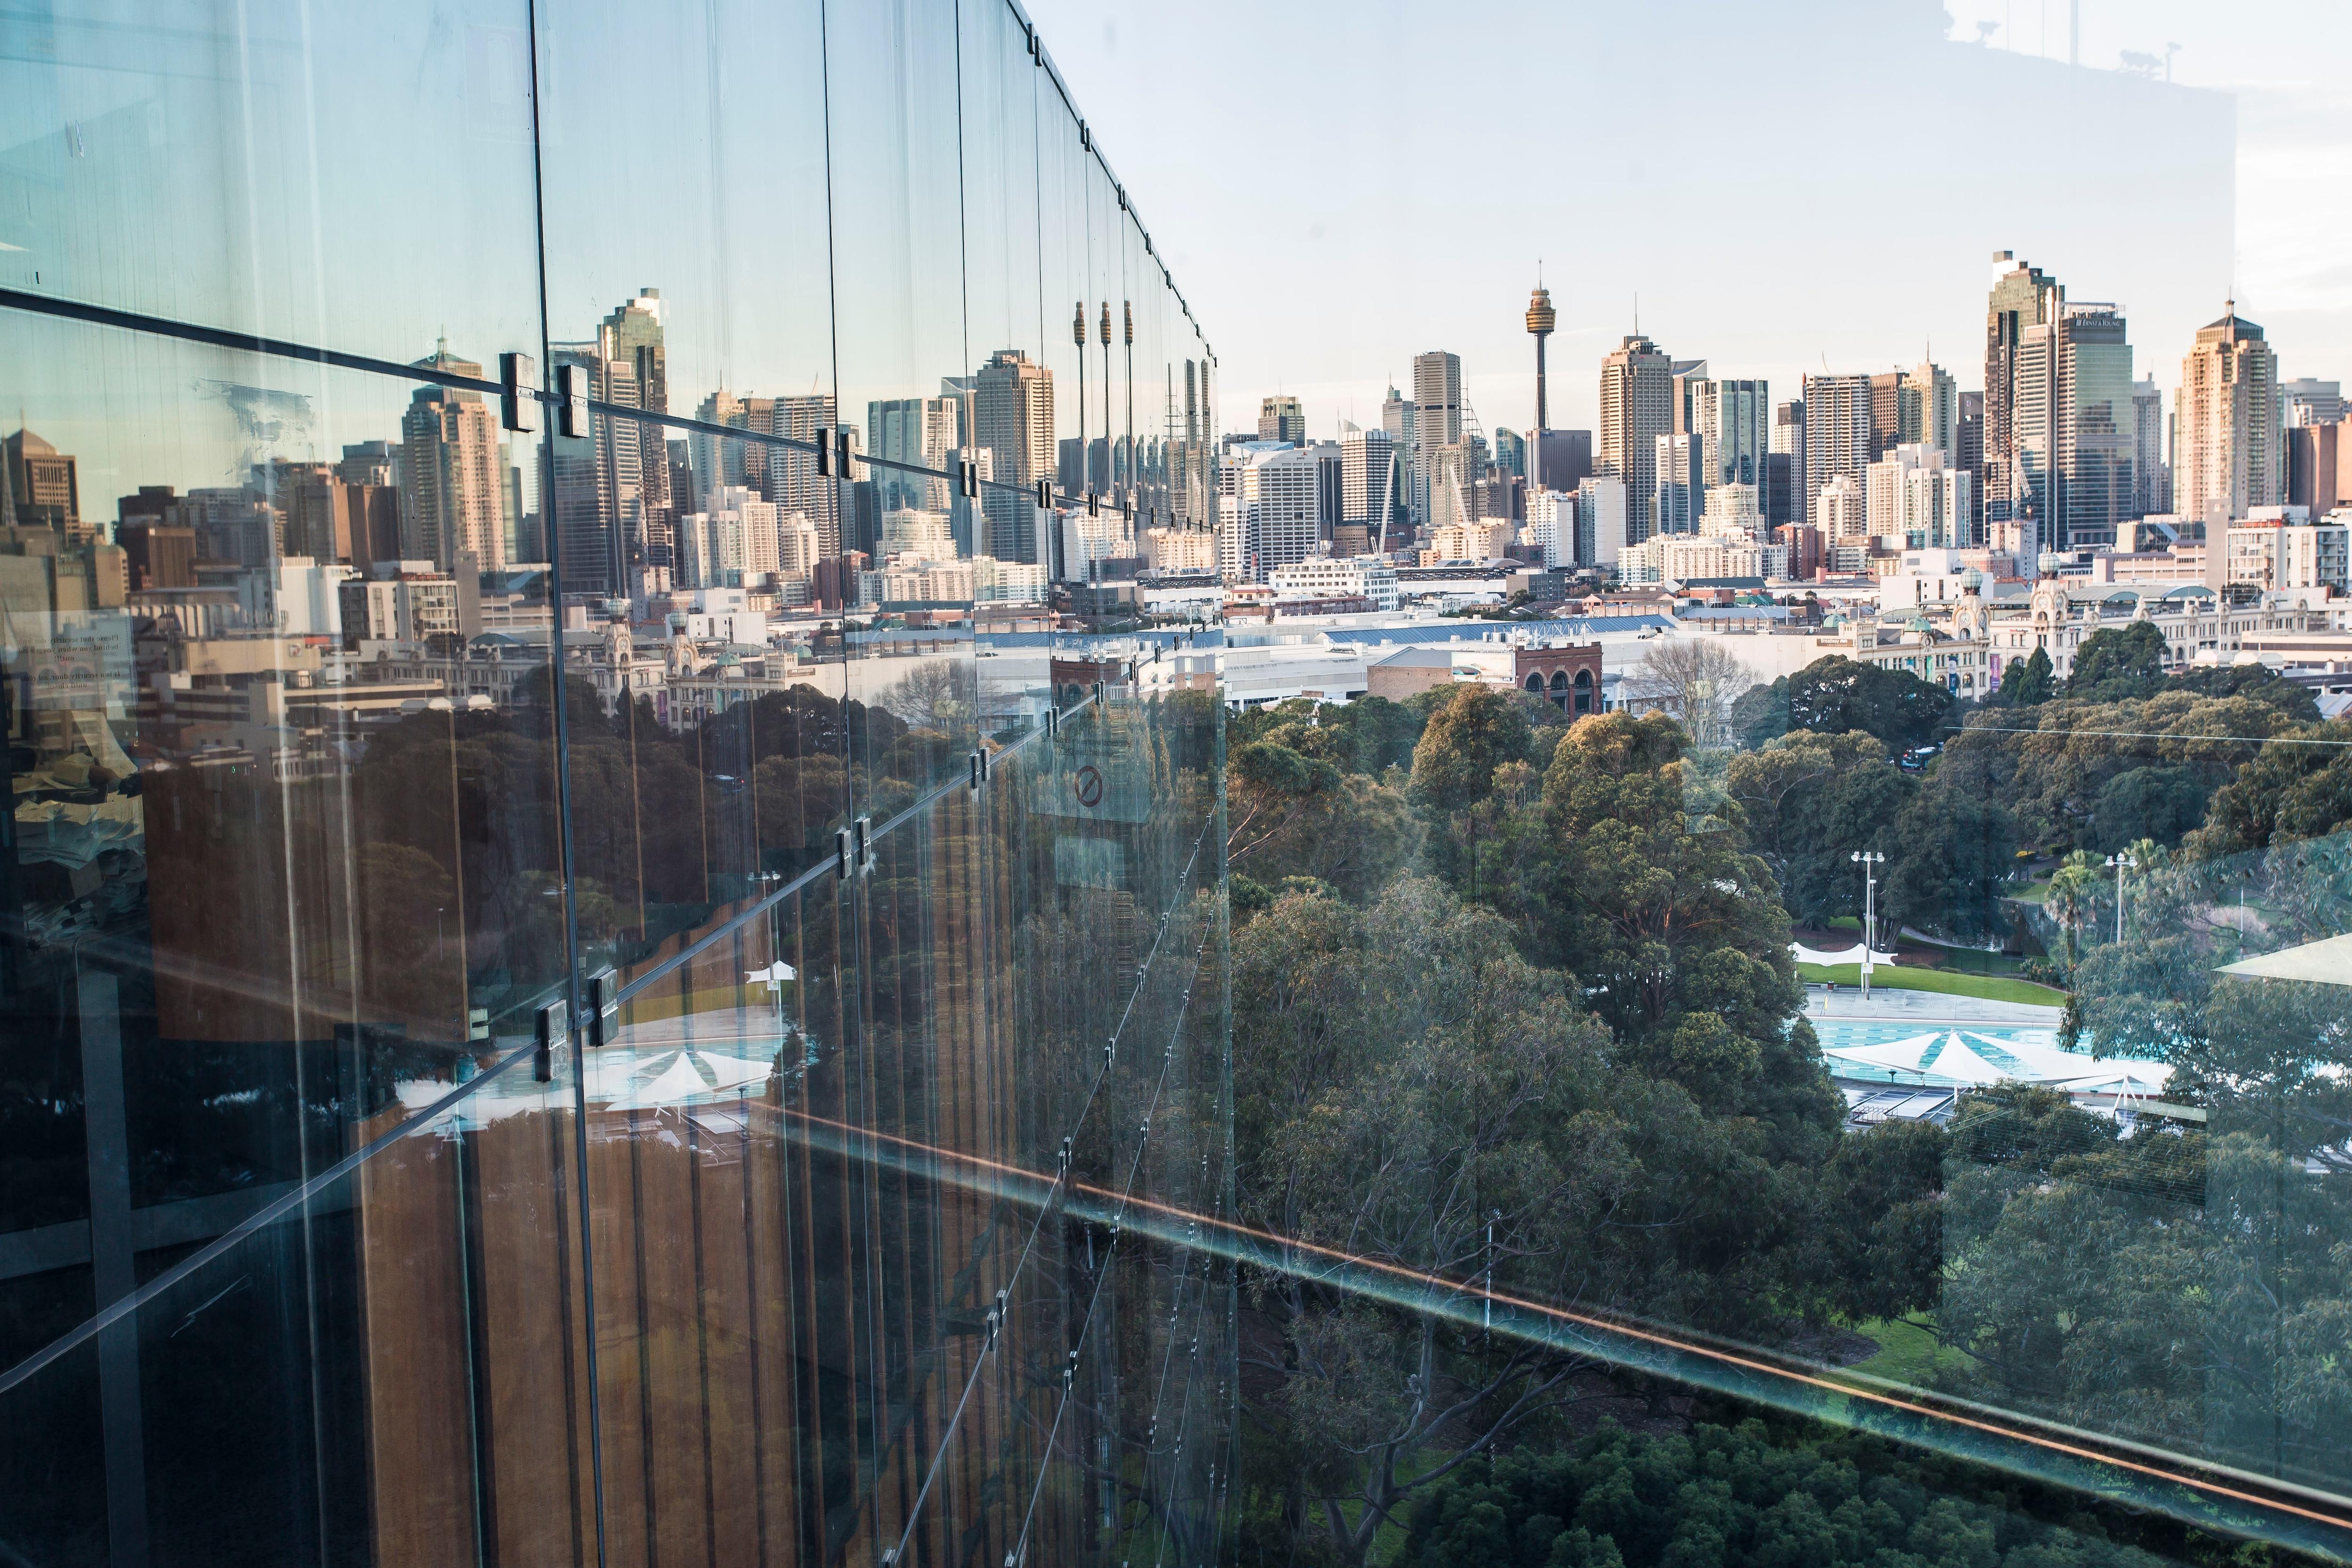 Contact us - The University of Sydney Law School